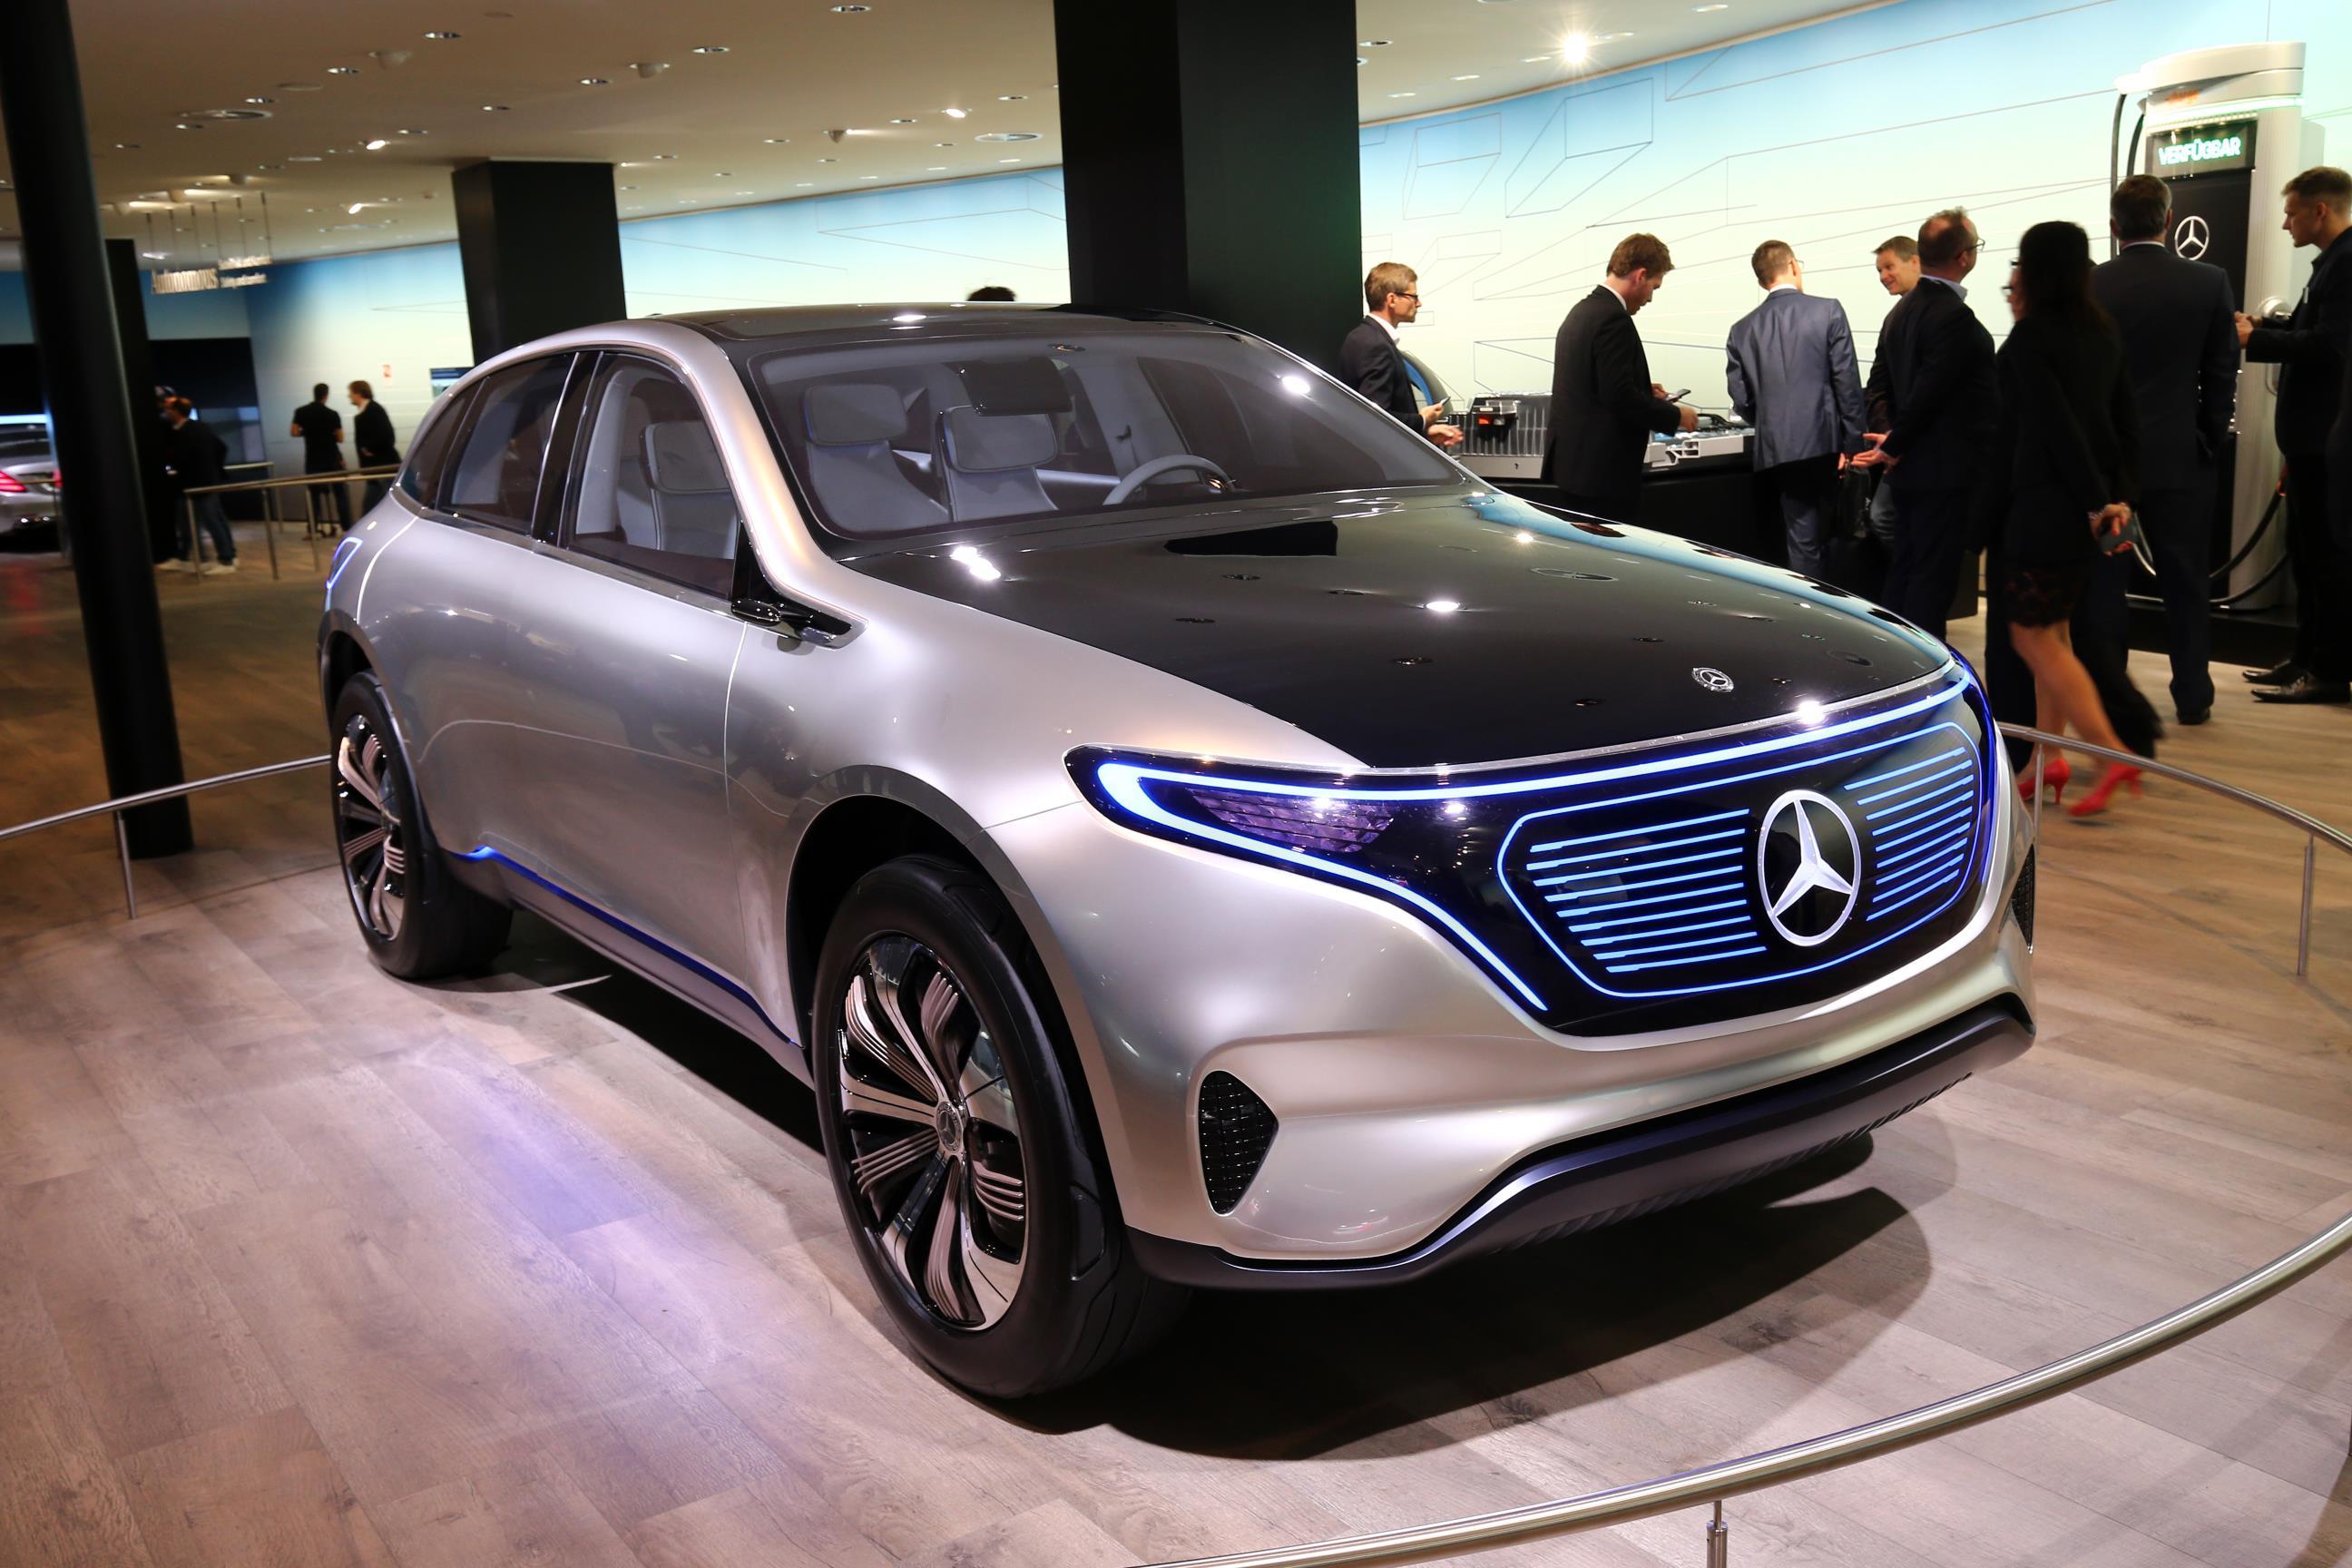 Mercedesbenz Concept Eqa Show Car  Myautoworldcom